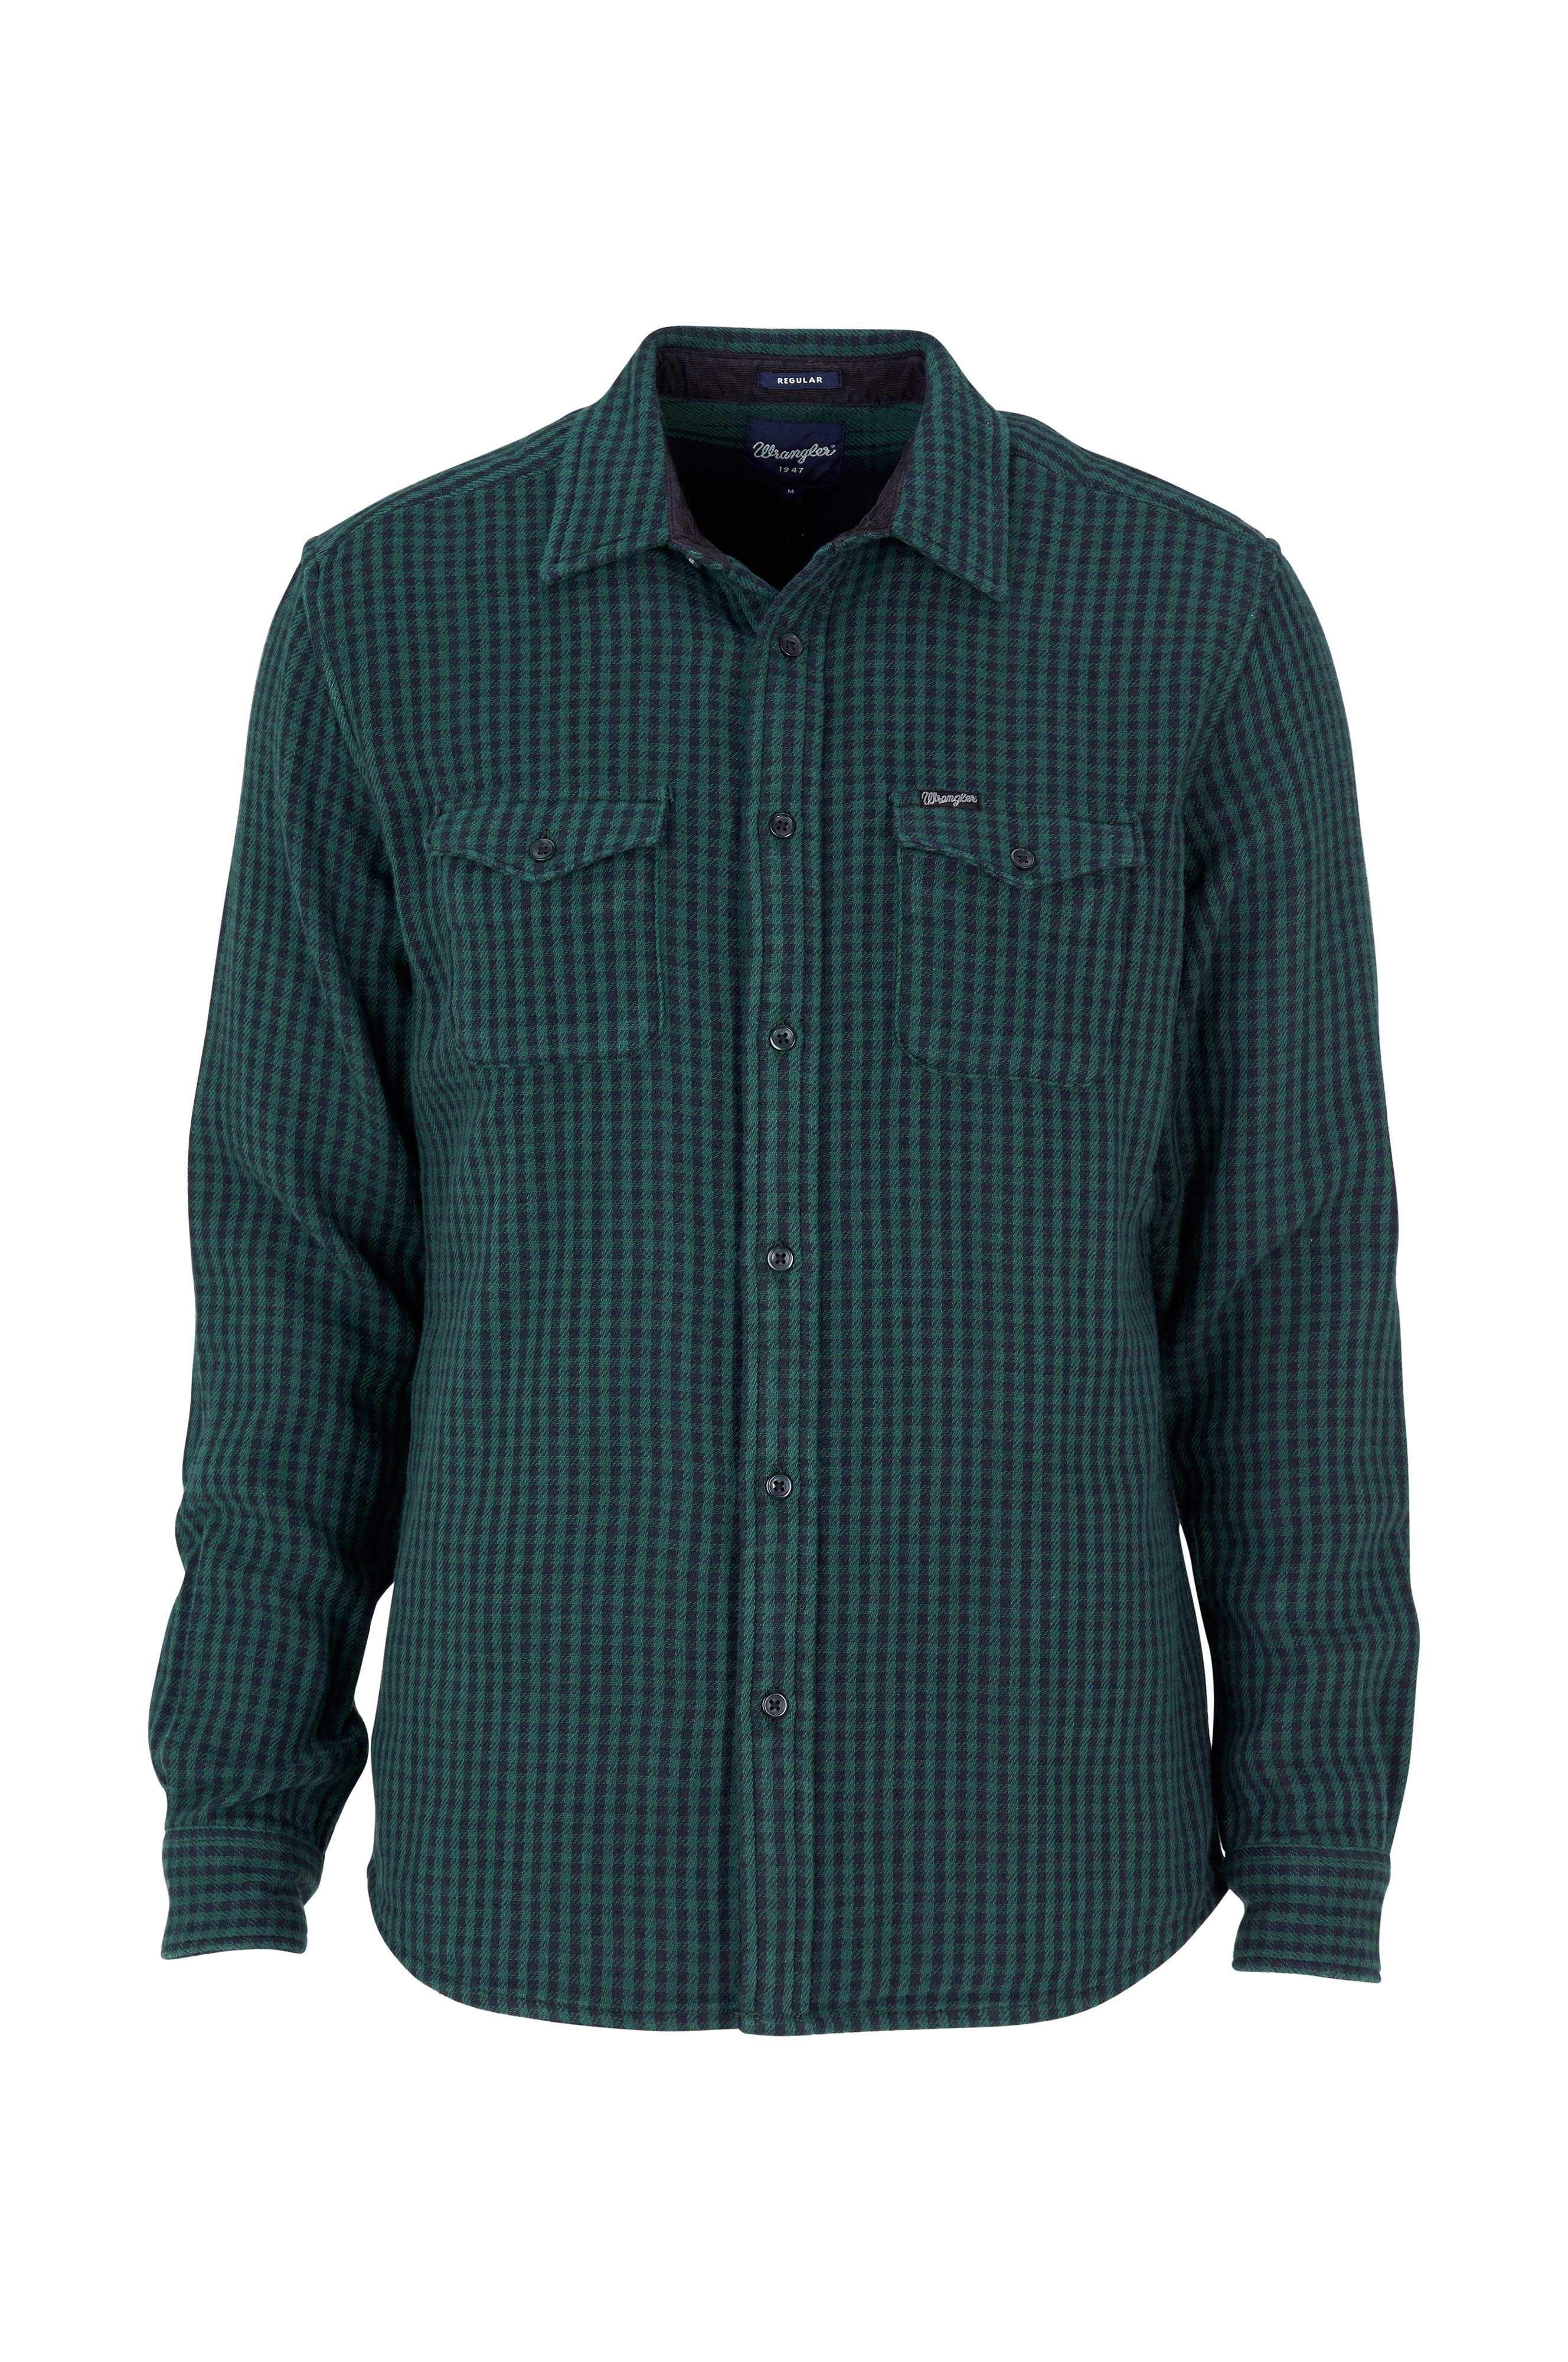 Wrangler Skjorta 2PKT Flap Shirt - Grön - Herr - Ellos.se d529c6acd026a